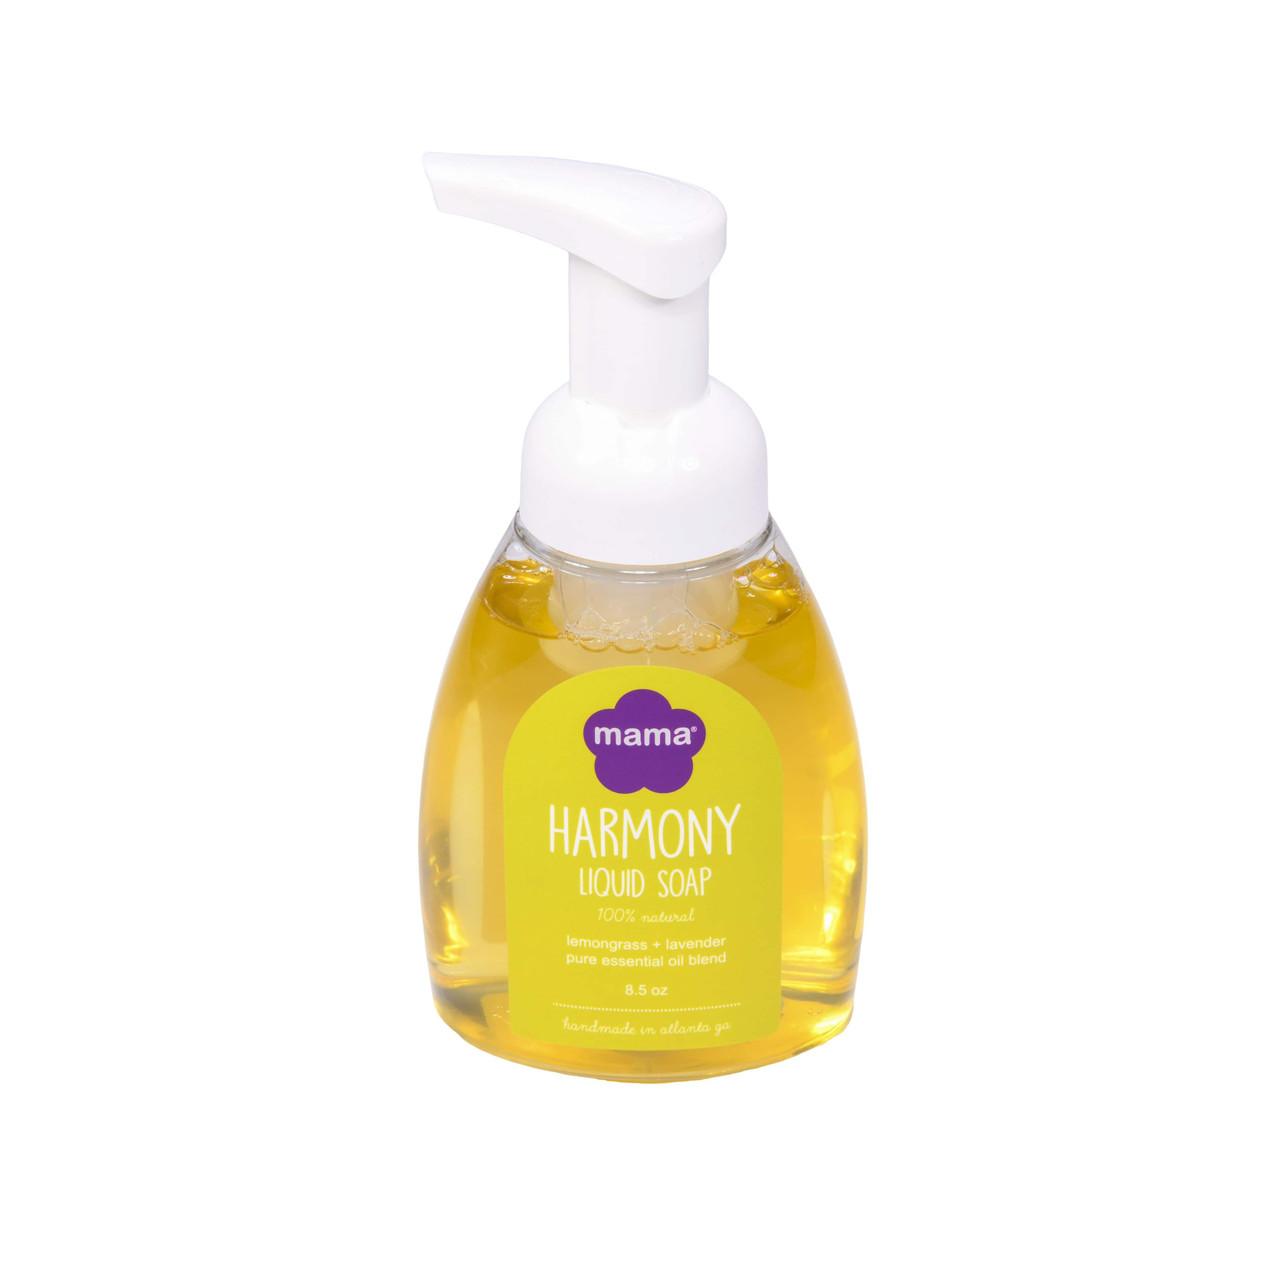 Harmony (Lavender + Lemongrass) Liquid Soap | Mama Bath + Body